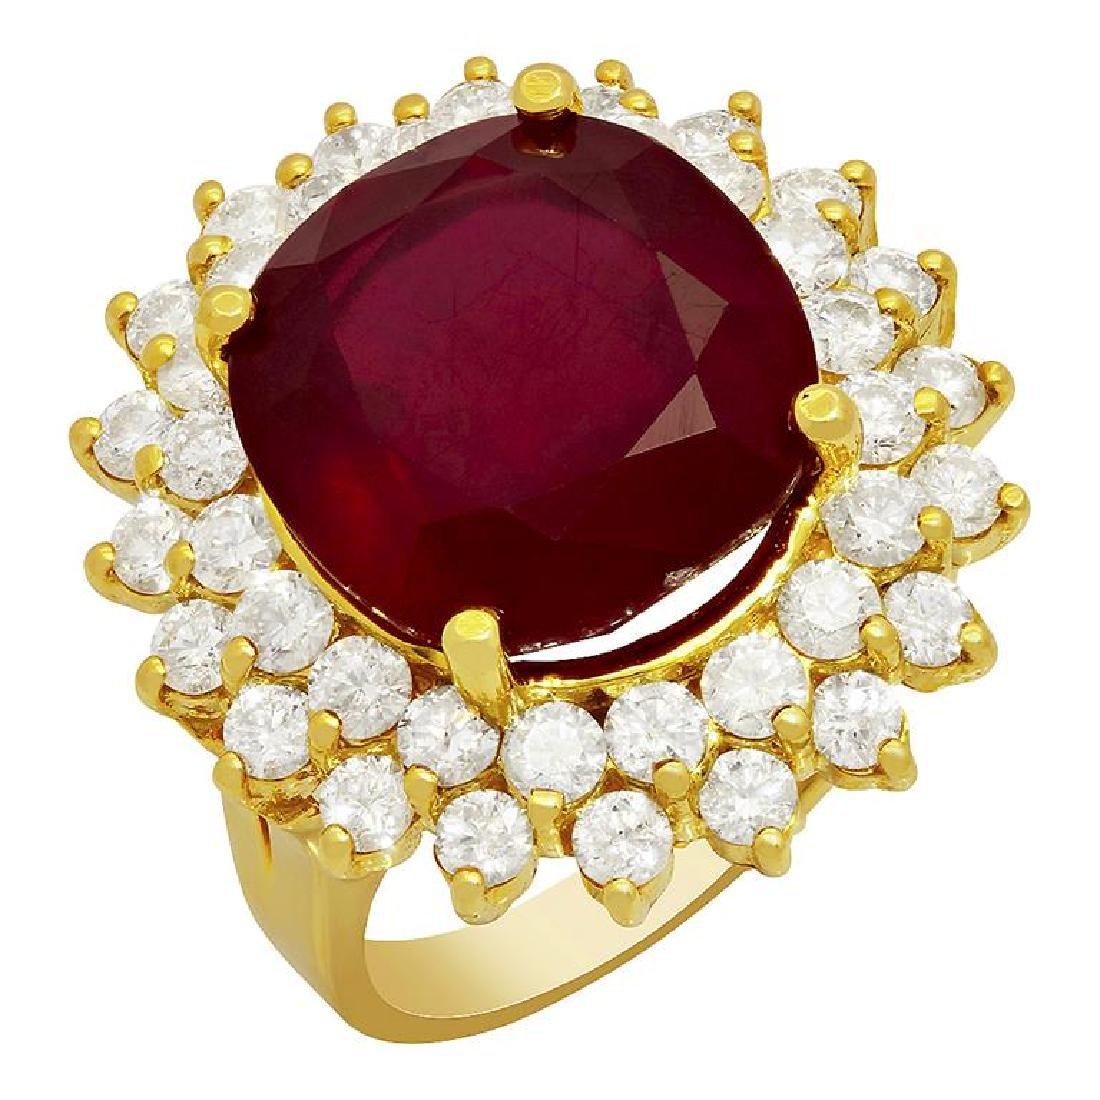 14k Yellow Gold 14.83ct Ruby 2.41ct Diamond Ring